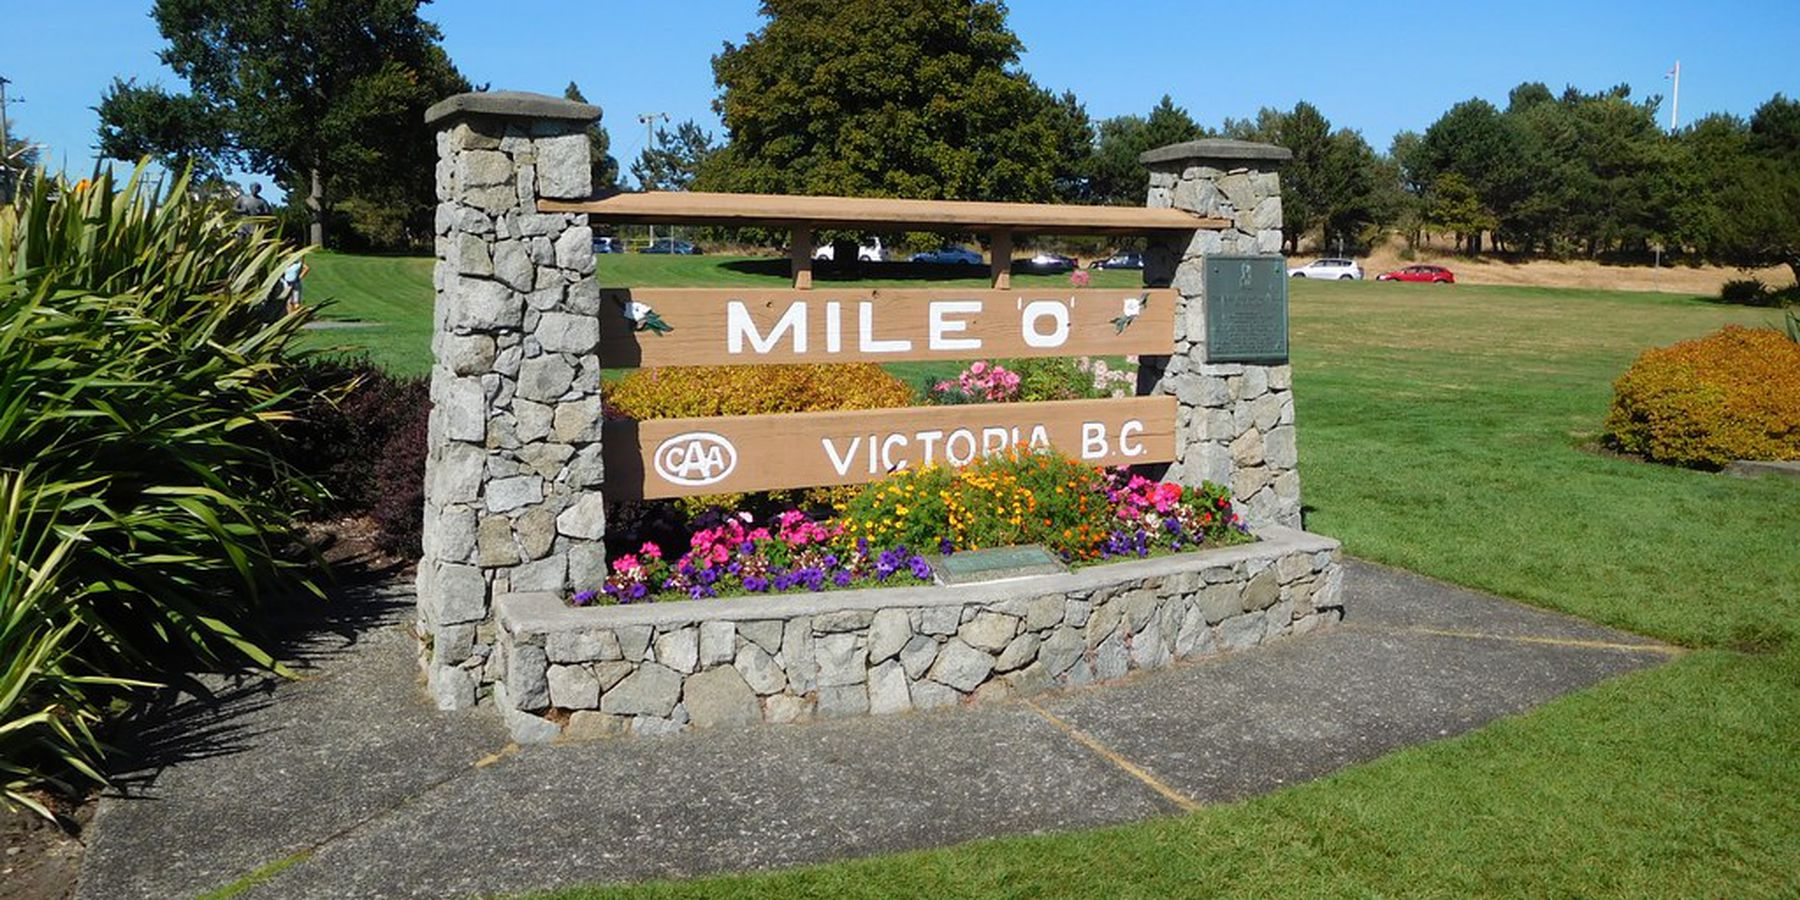 Beacon Hill Park - Victoria - Vancouver Island - British Columbia - Canada - Doets Reizen